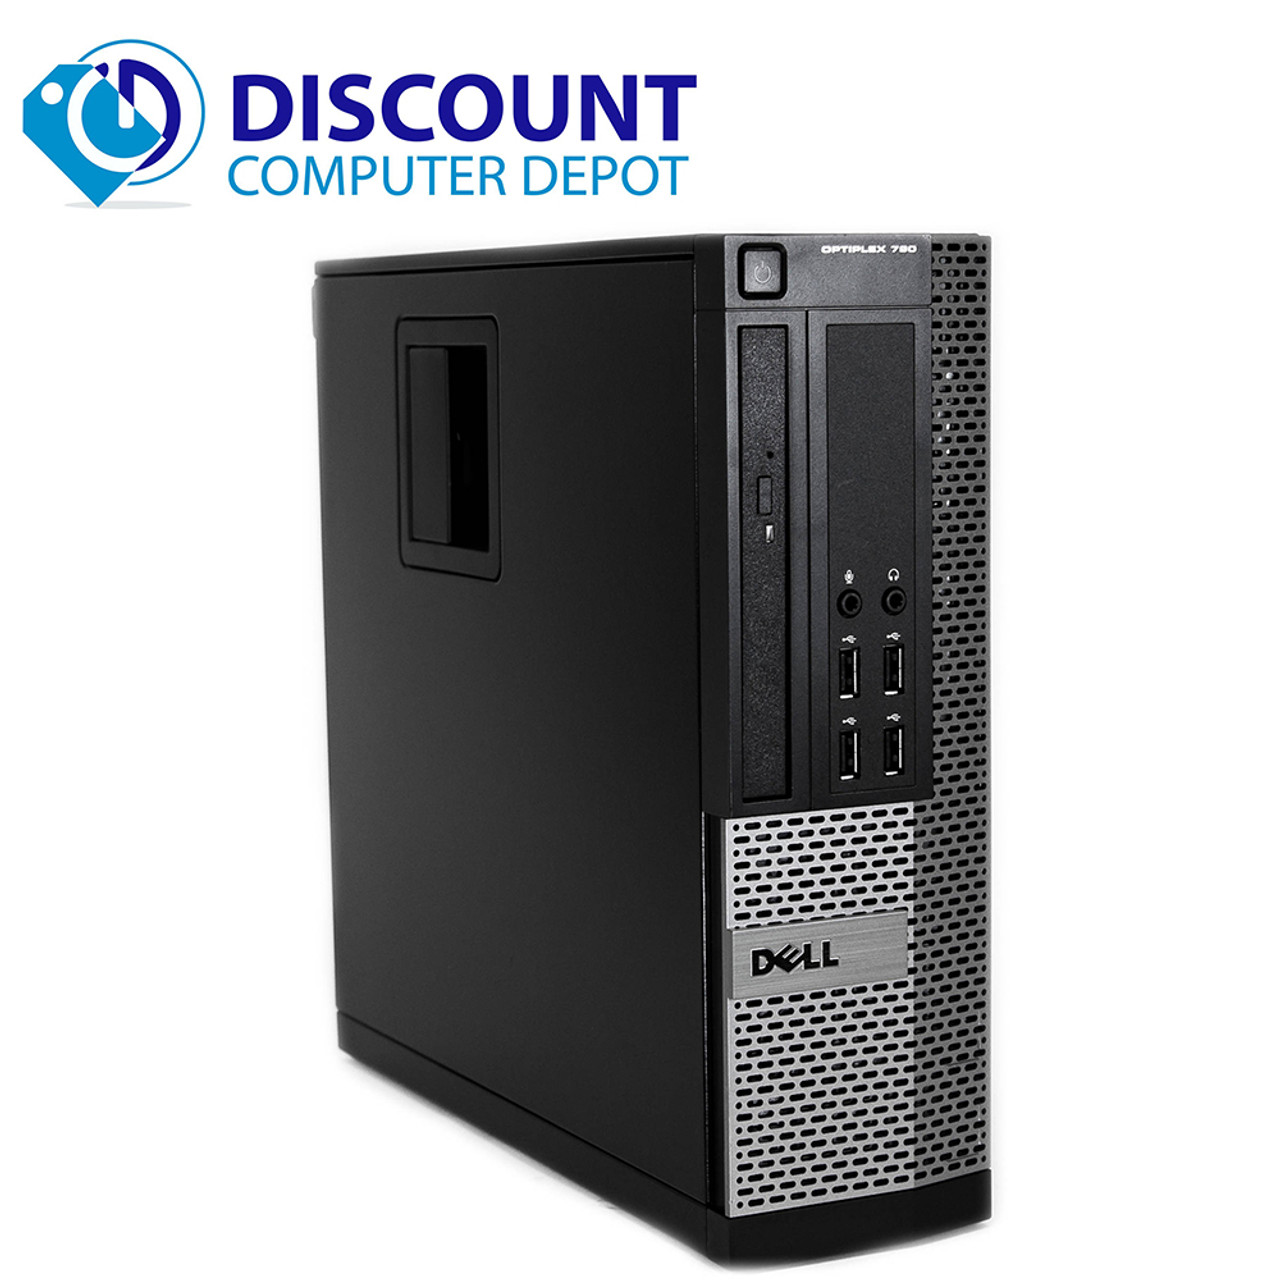 Dell Optiplex 790 Desktop Computer PC Quad i5 8GB 1TB 3 1GHz Windows 10 Pro  and WIFI